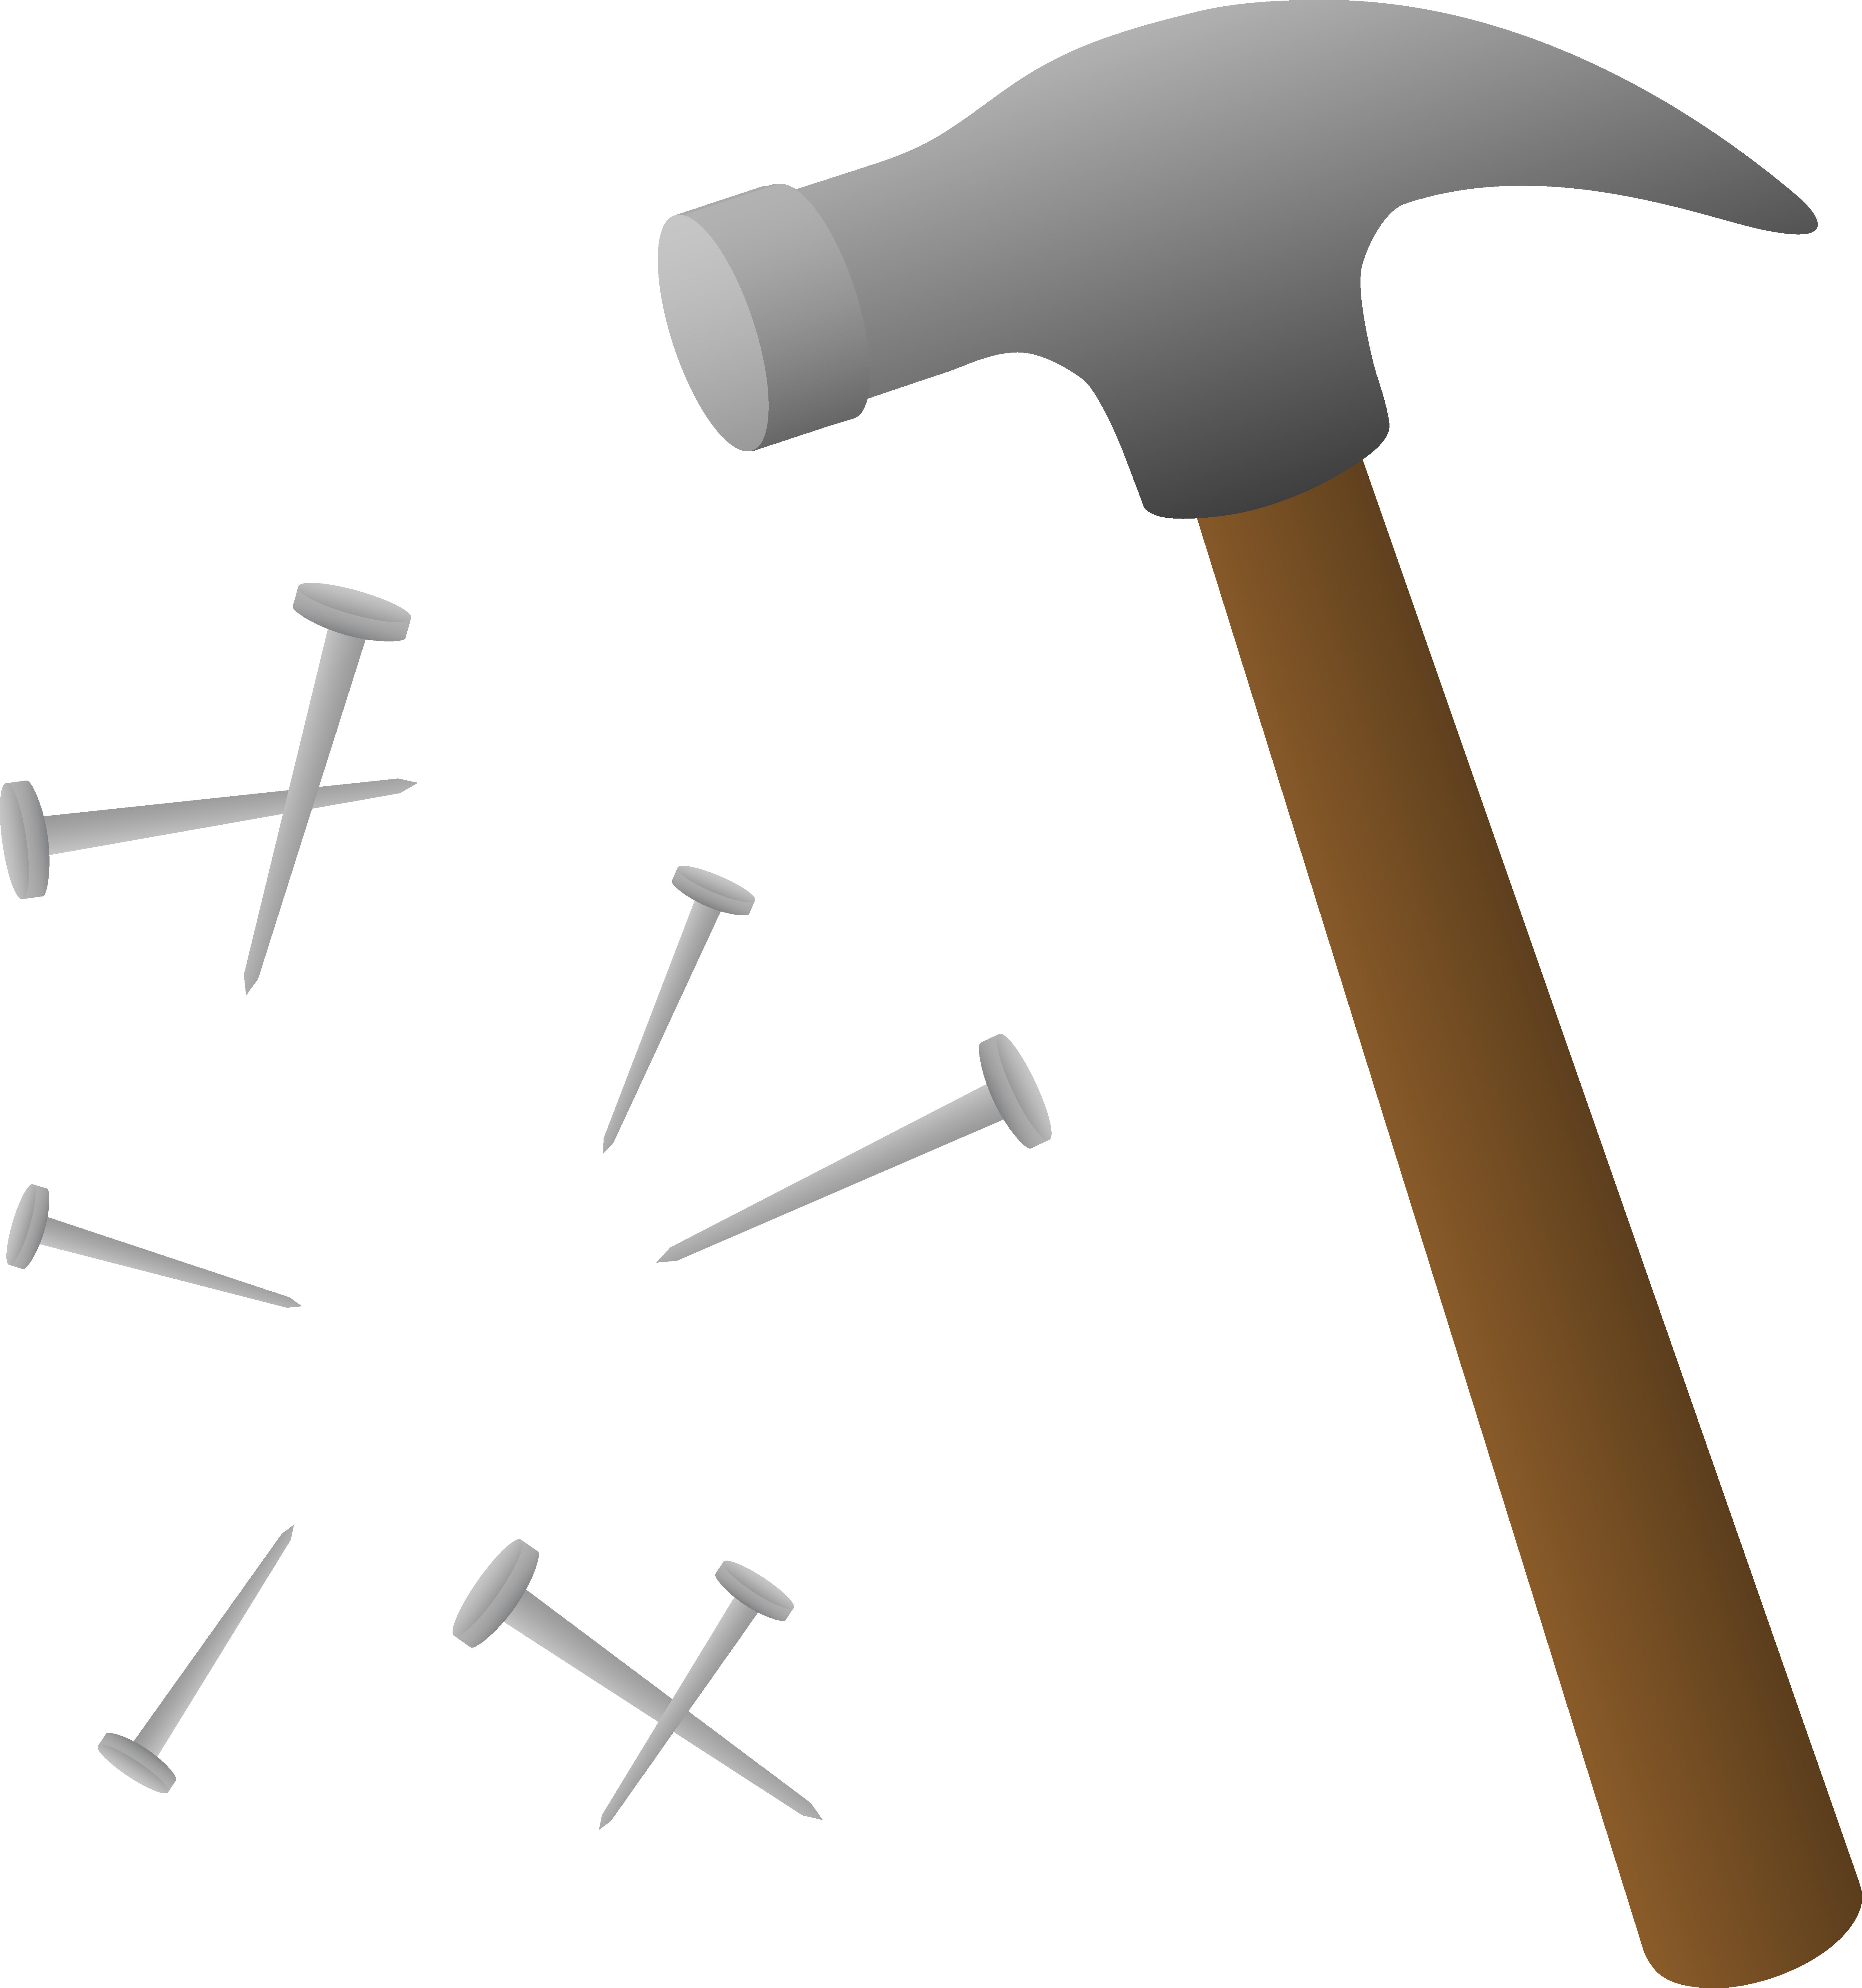 Hammer clip art download.